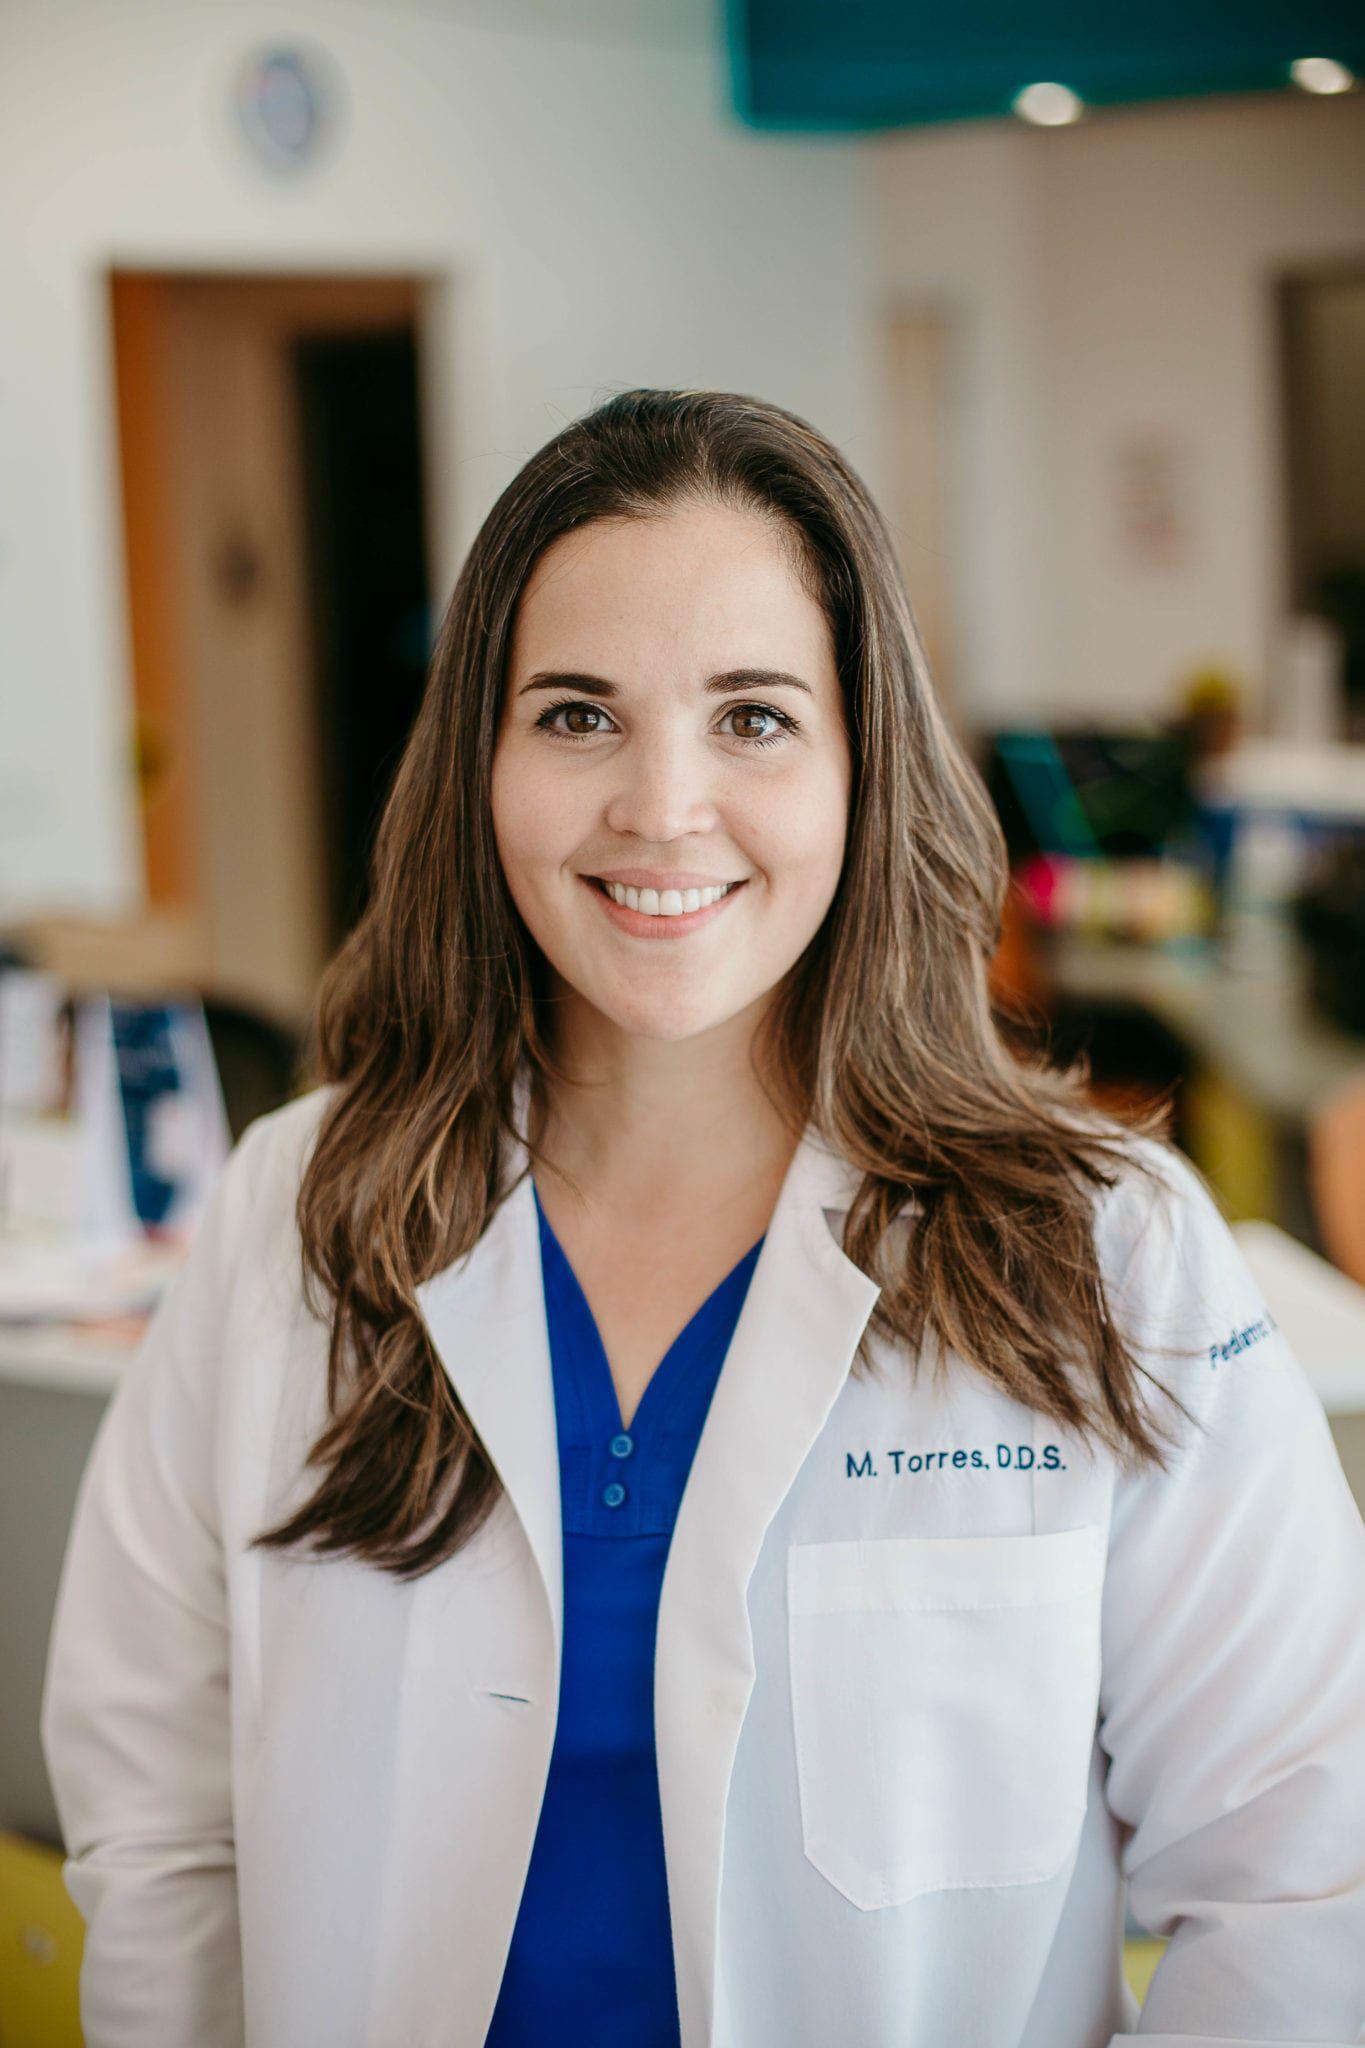 Dr. Torres in Kids World Pediatric Dentistry